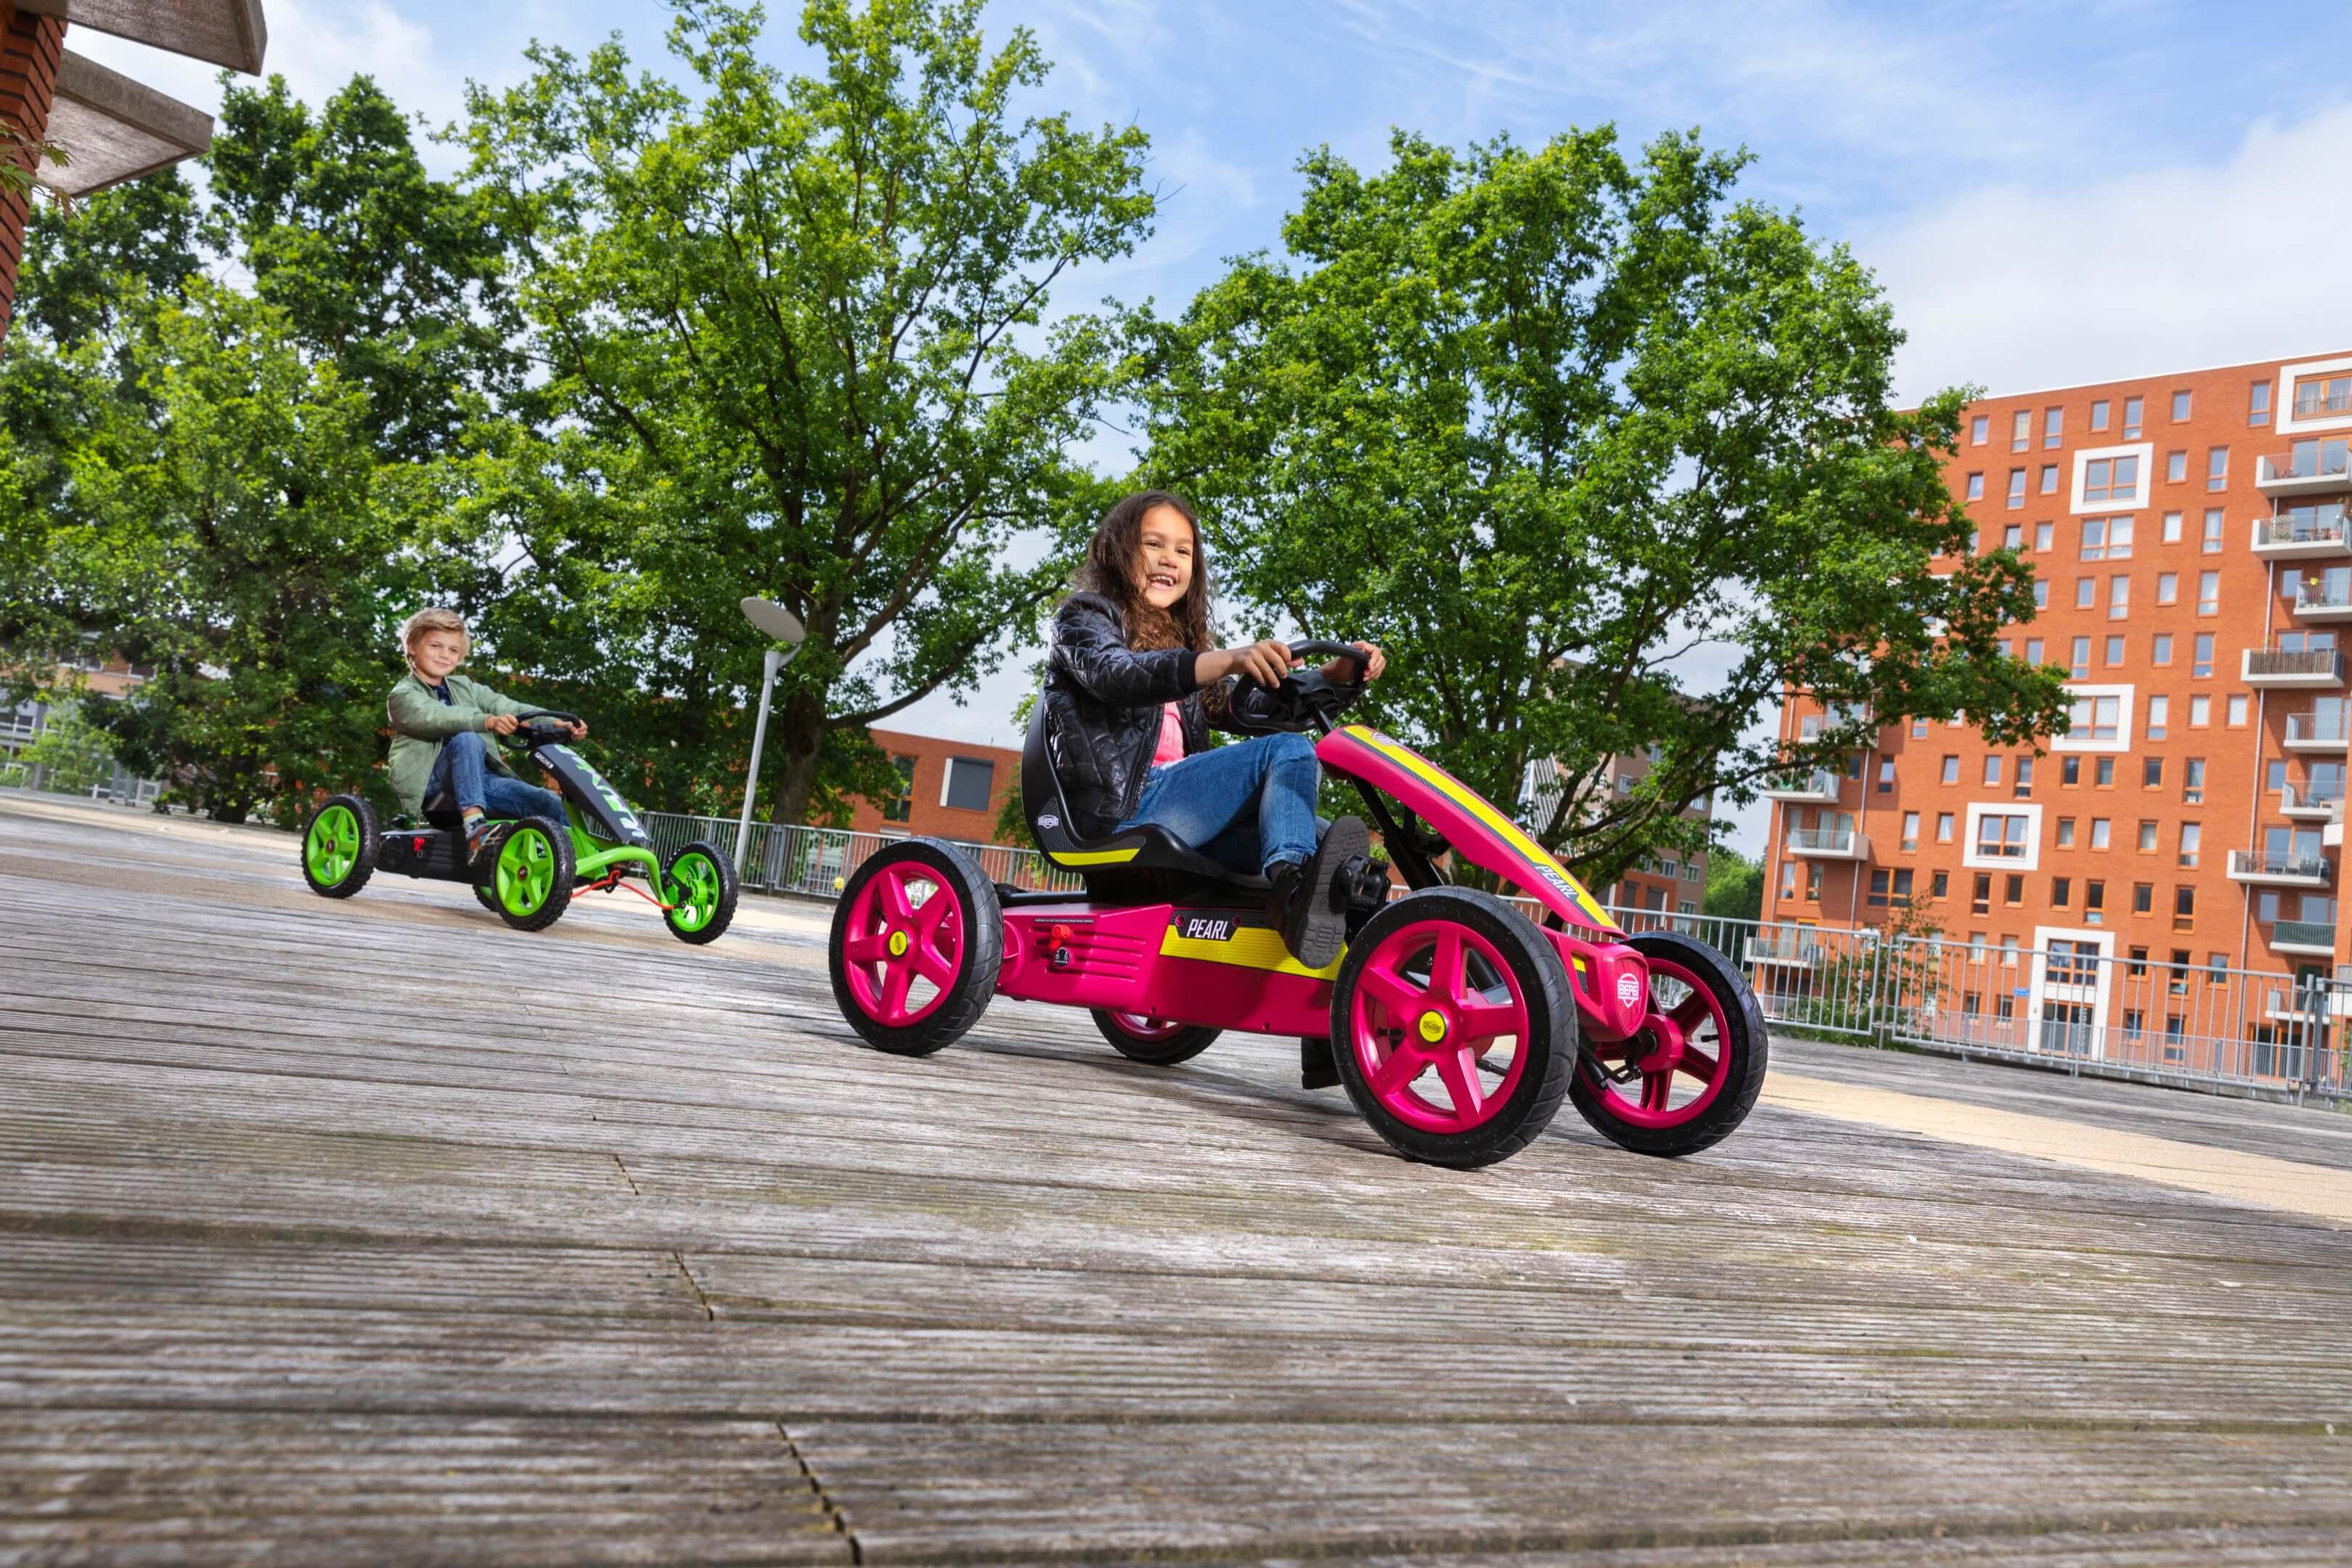 Jurjen Poeles fotografie Berg Toys skelter speelgoed lifestyle actief buiten spelen kinderen kind gocart pedal go kart go-kart